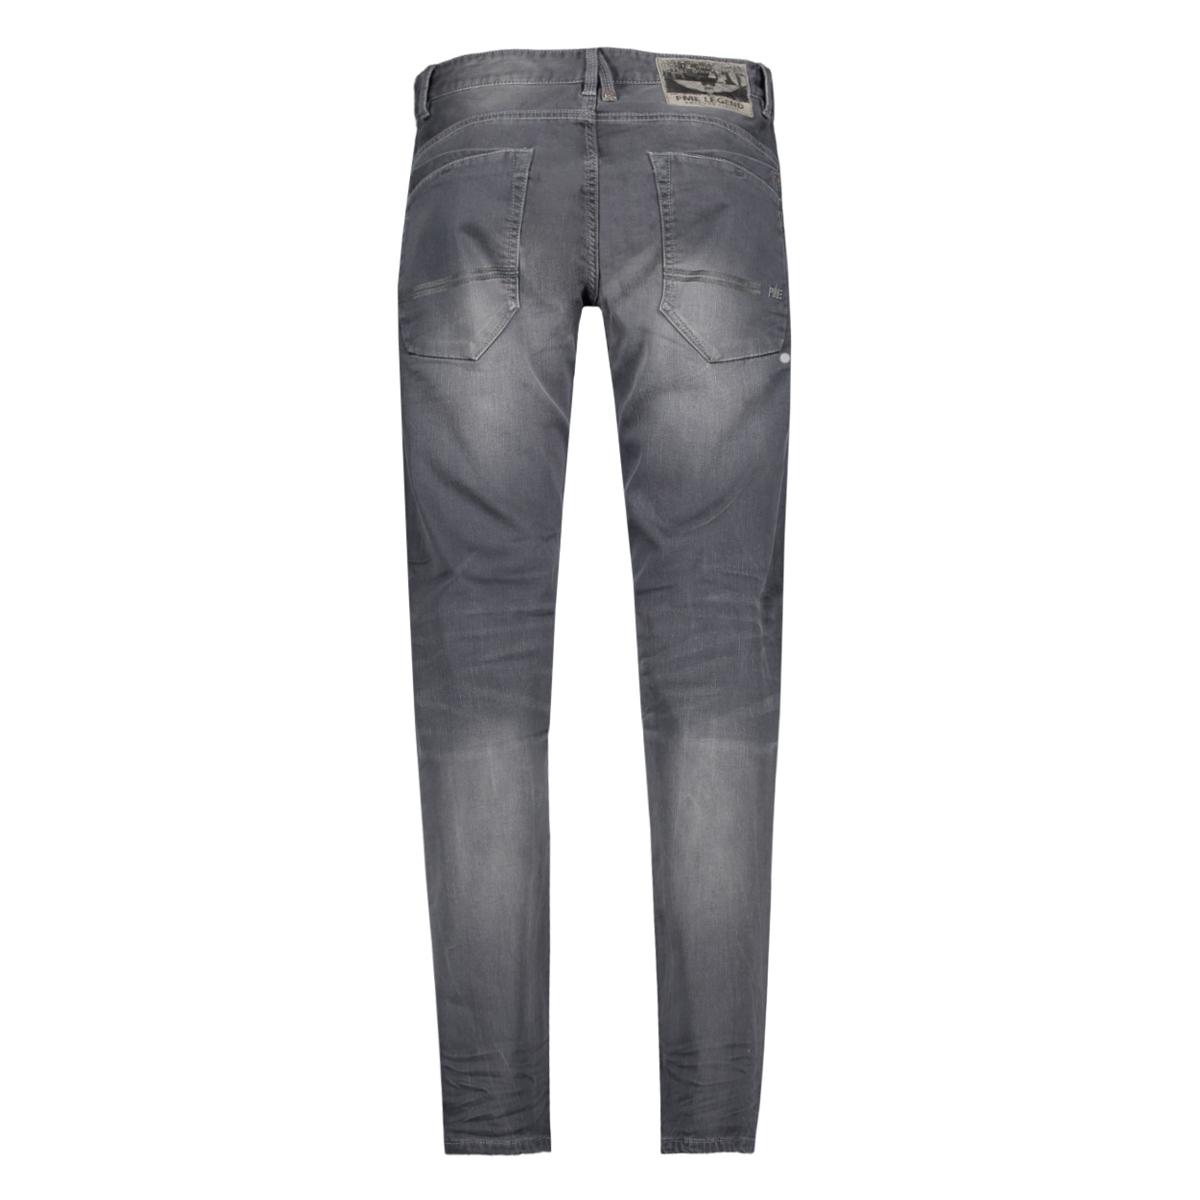 bare metal 2 grey sweat denim ptr975 pme legend jeans mdg